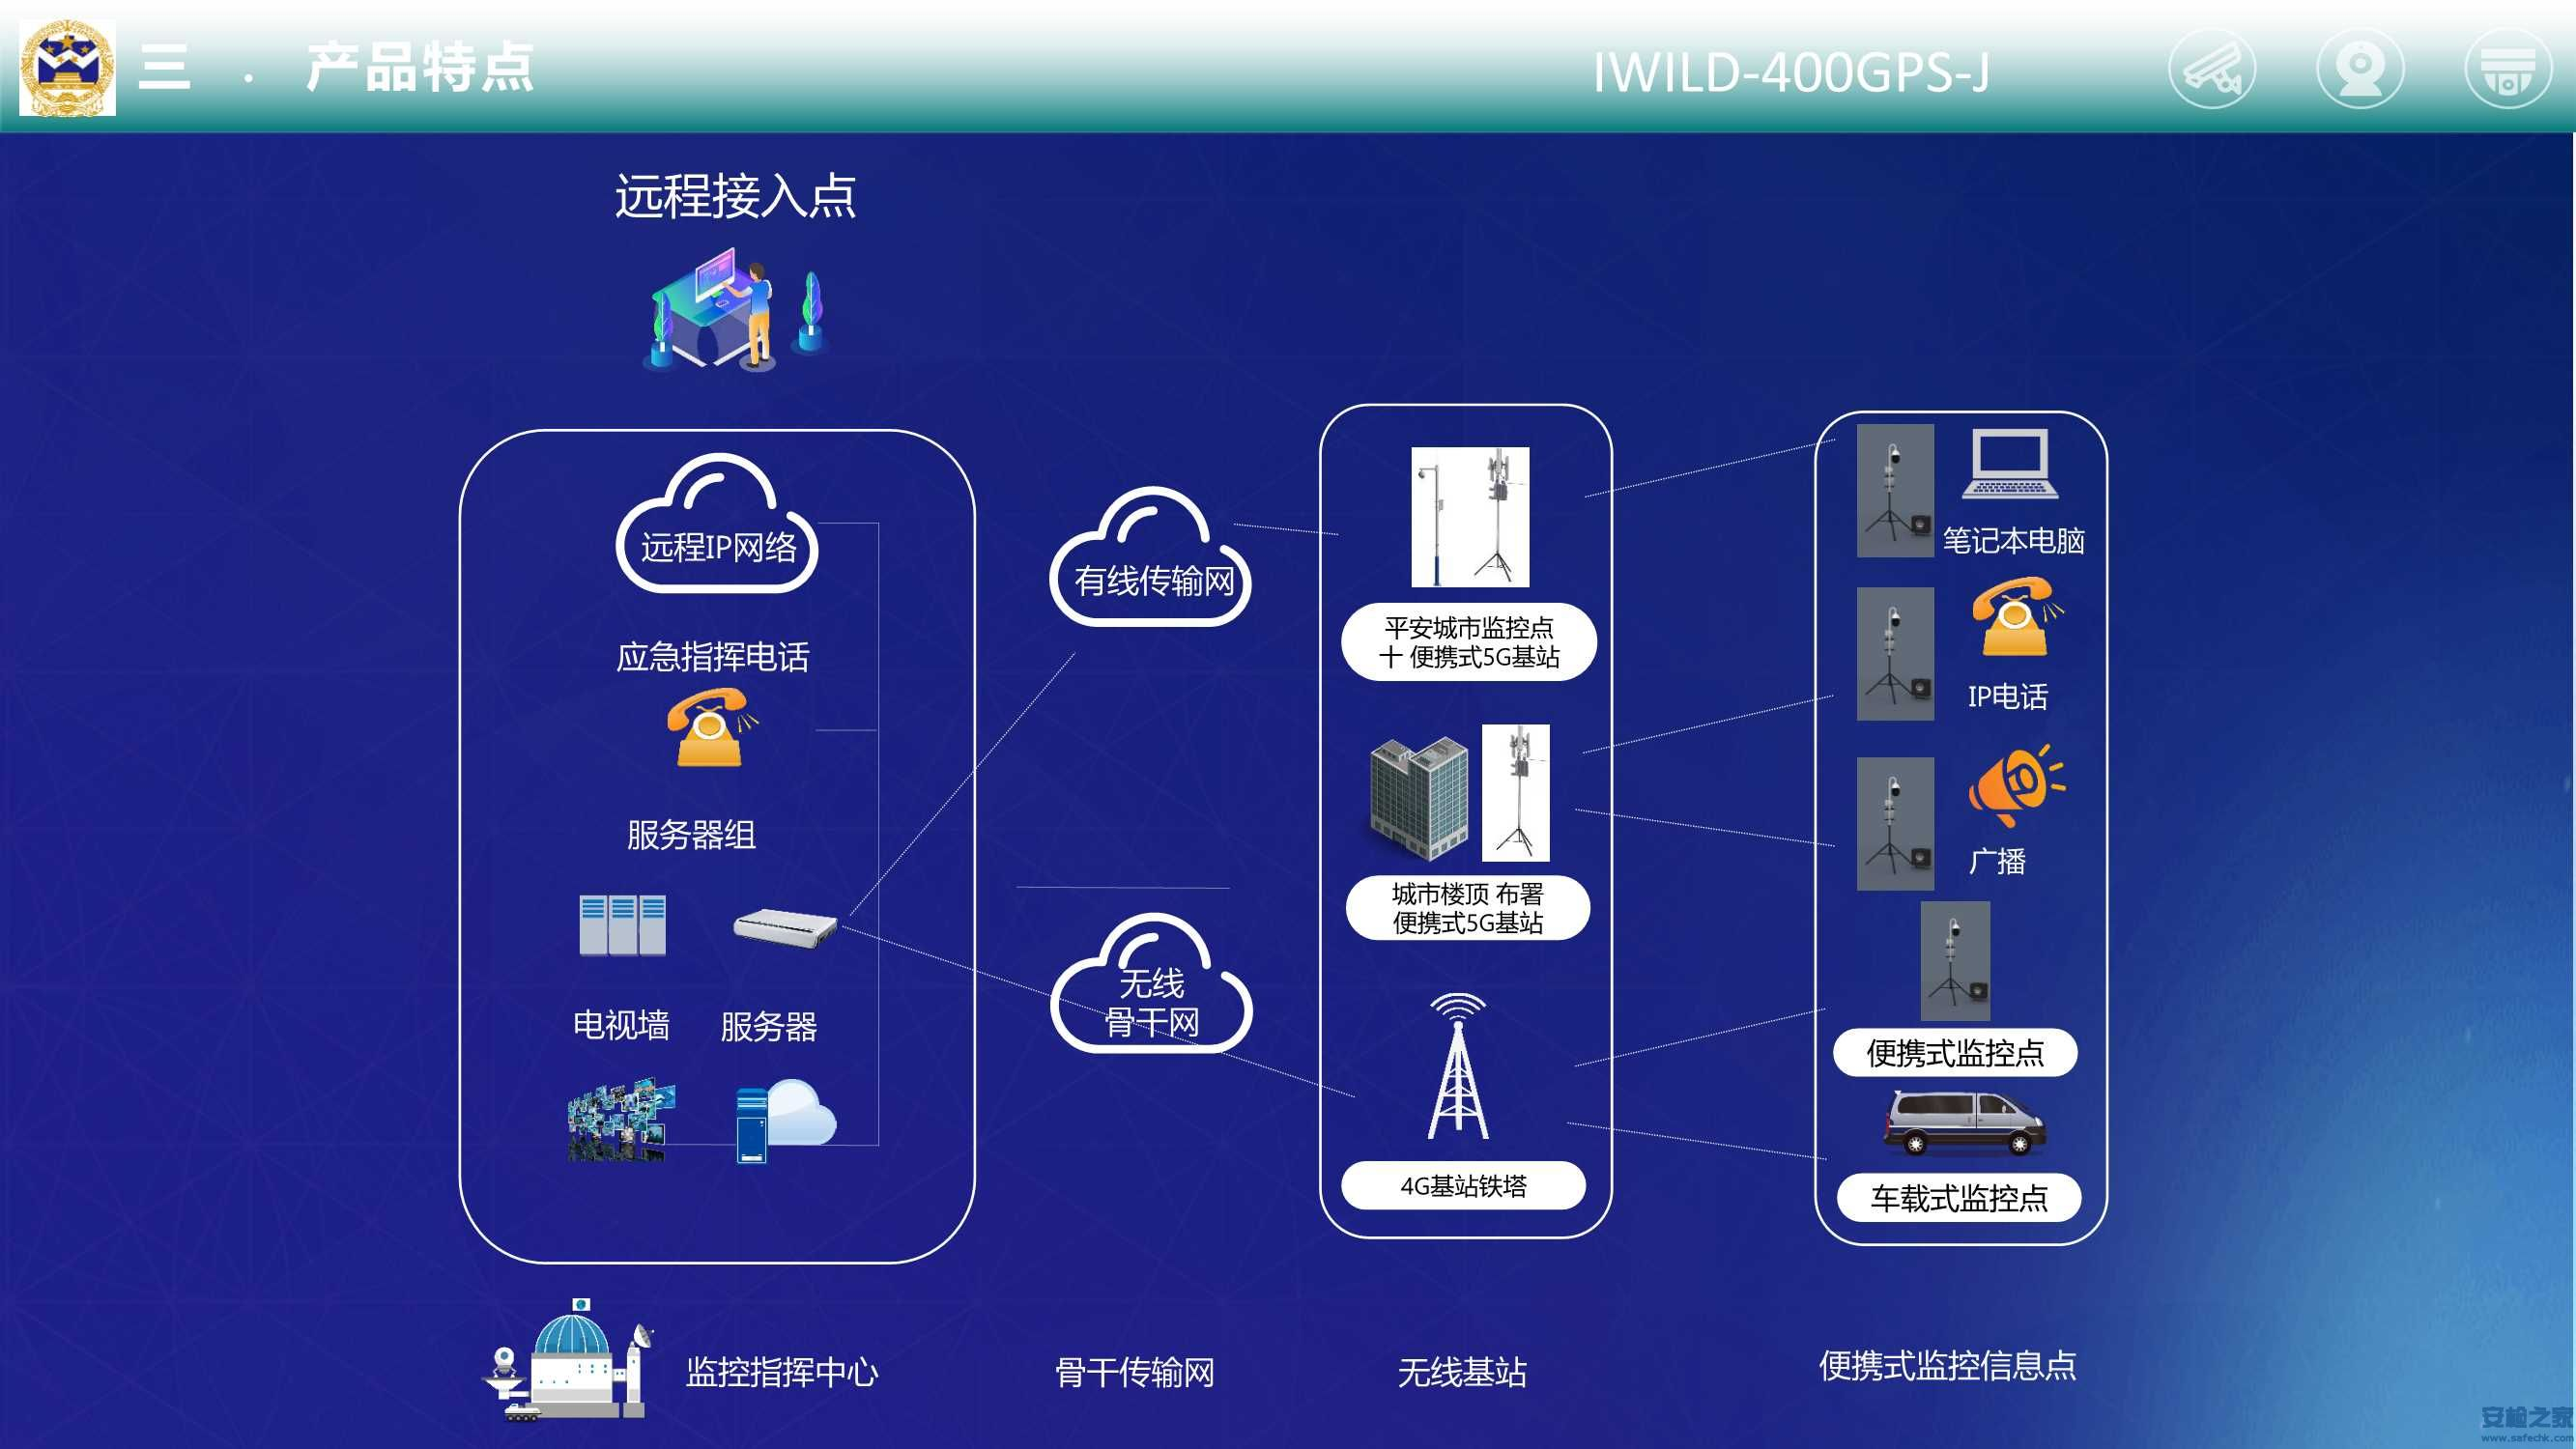 IWILD-400GPS-J便携式监控布防系统_5.Jpg